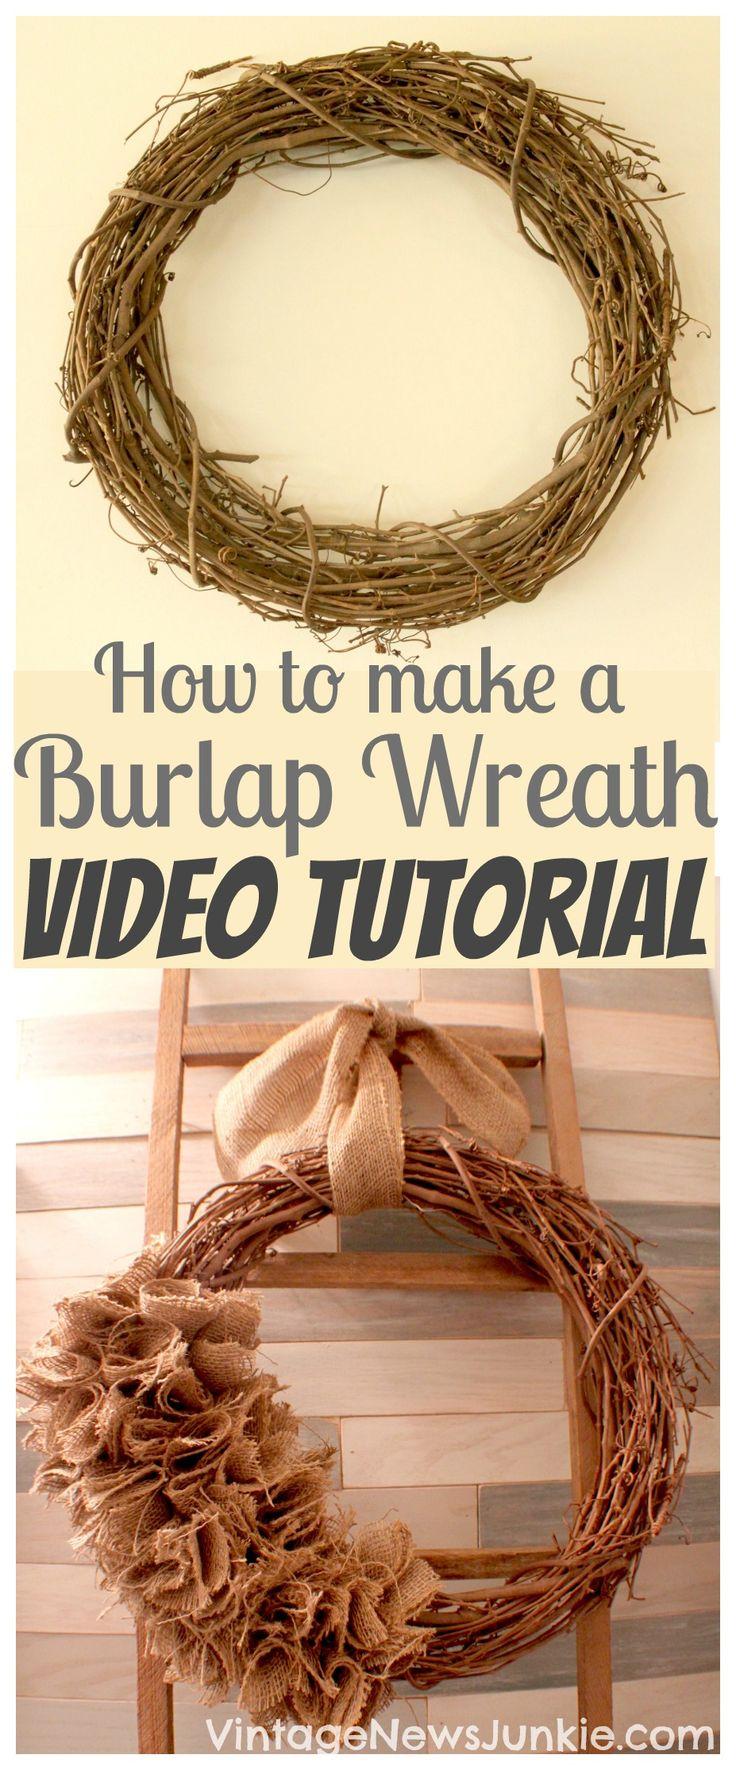 How to Make a Burlap Wreath Video Tutorial